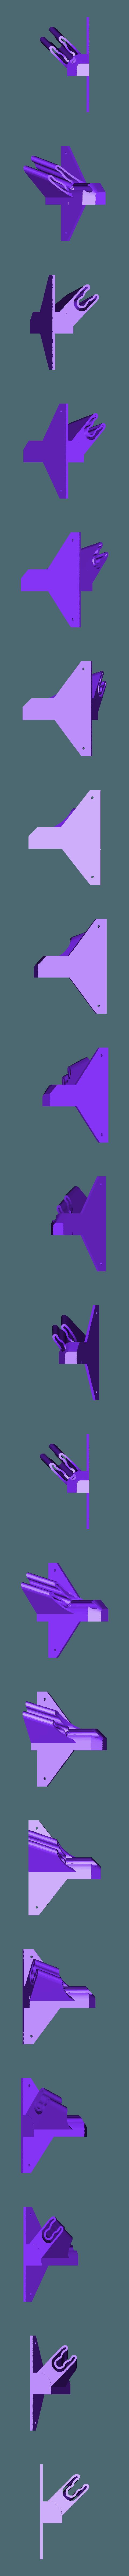 OculusRiftSensorHolder.stl Télécharger fichier STL gratuit Oculus Rift sensor holder • Plan pour impression 3D, HagridleVrai